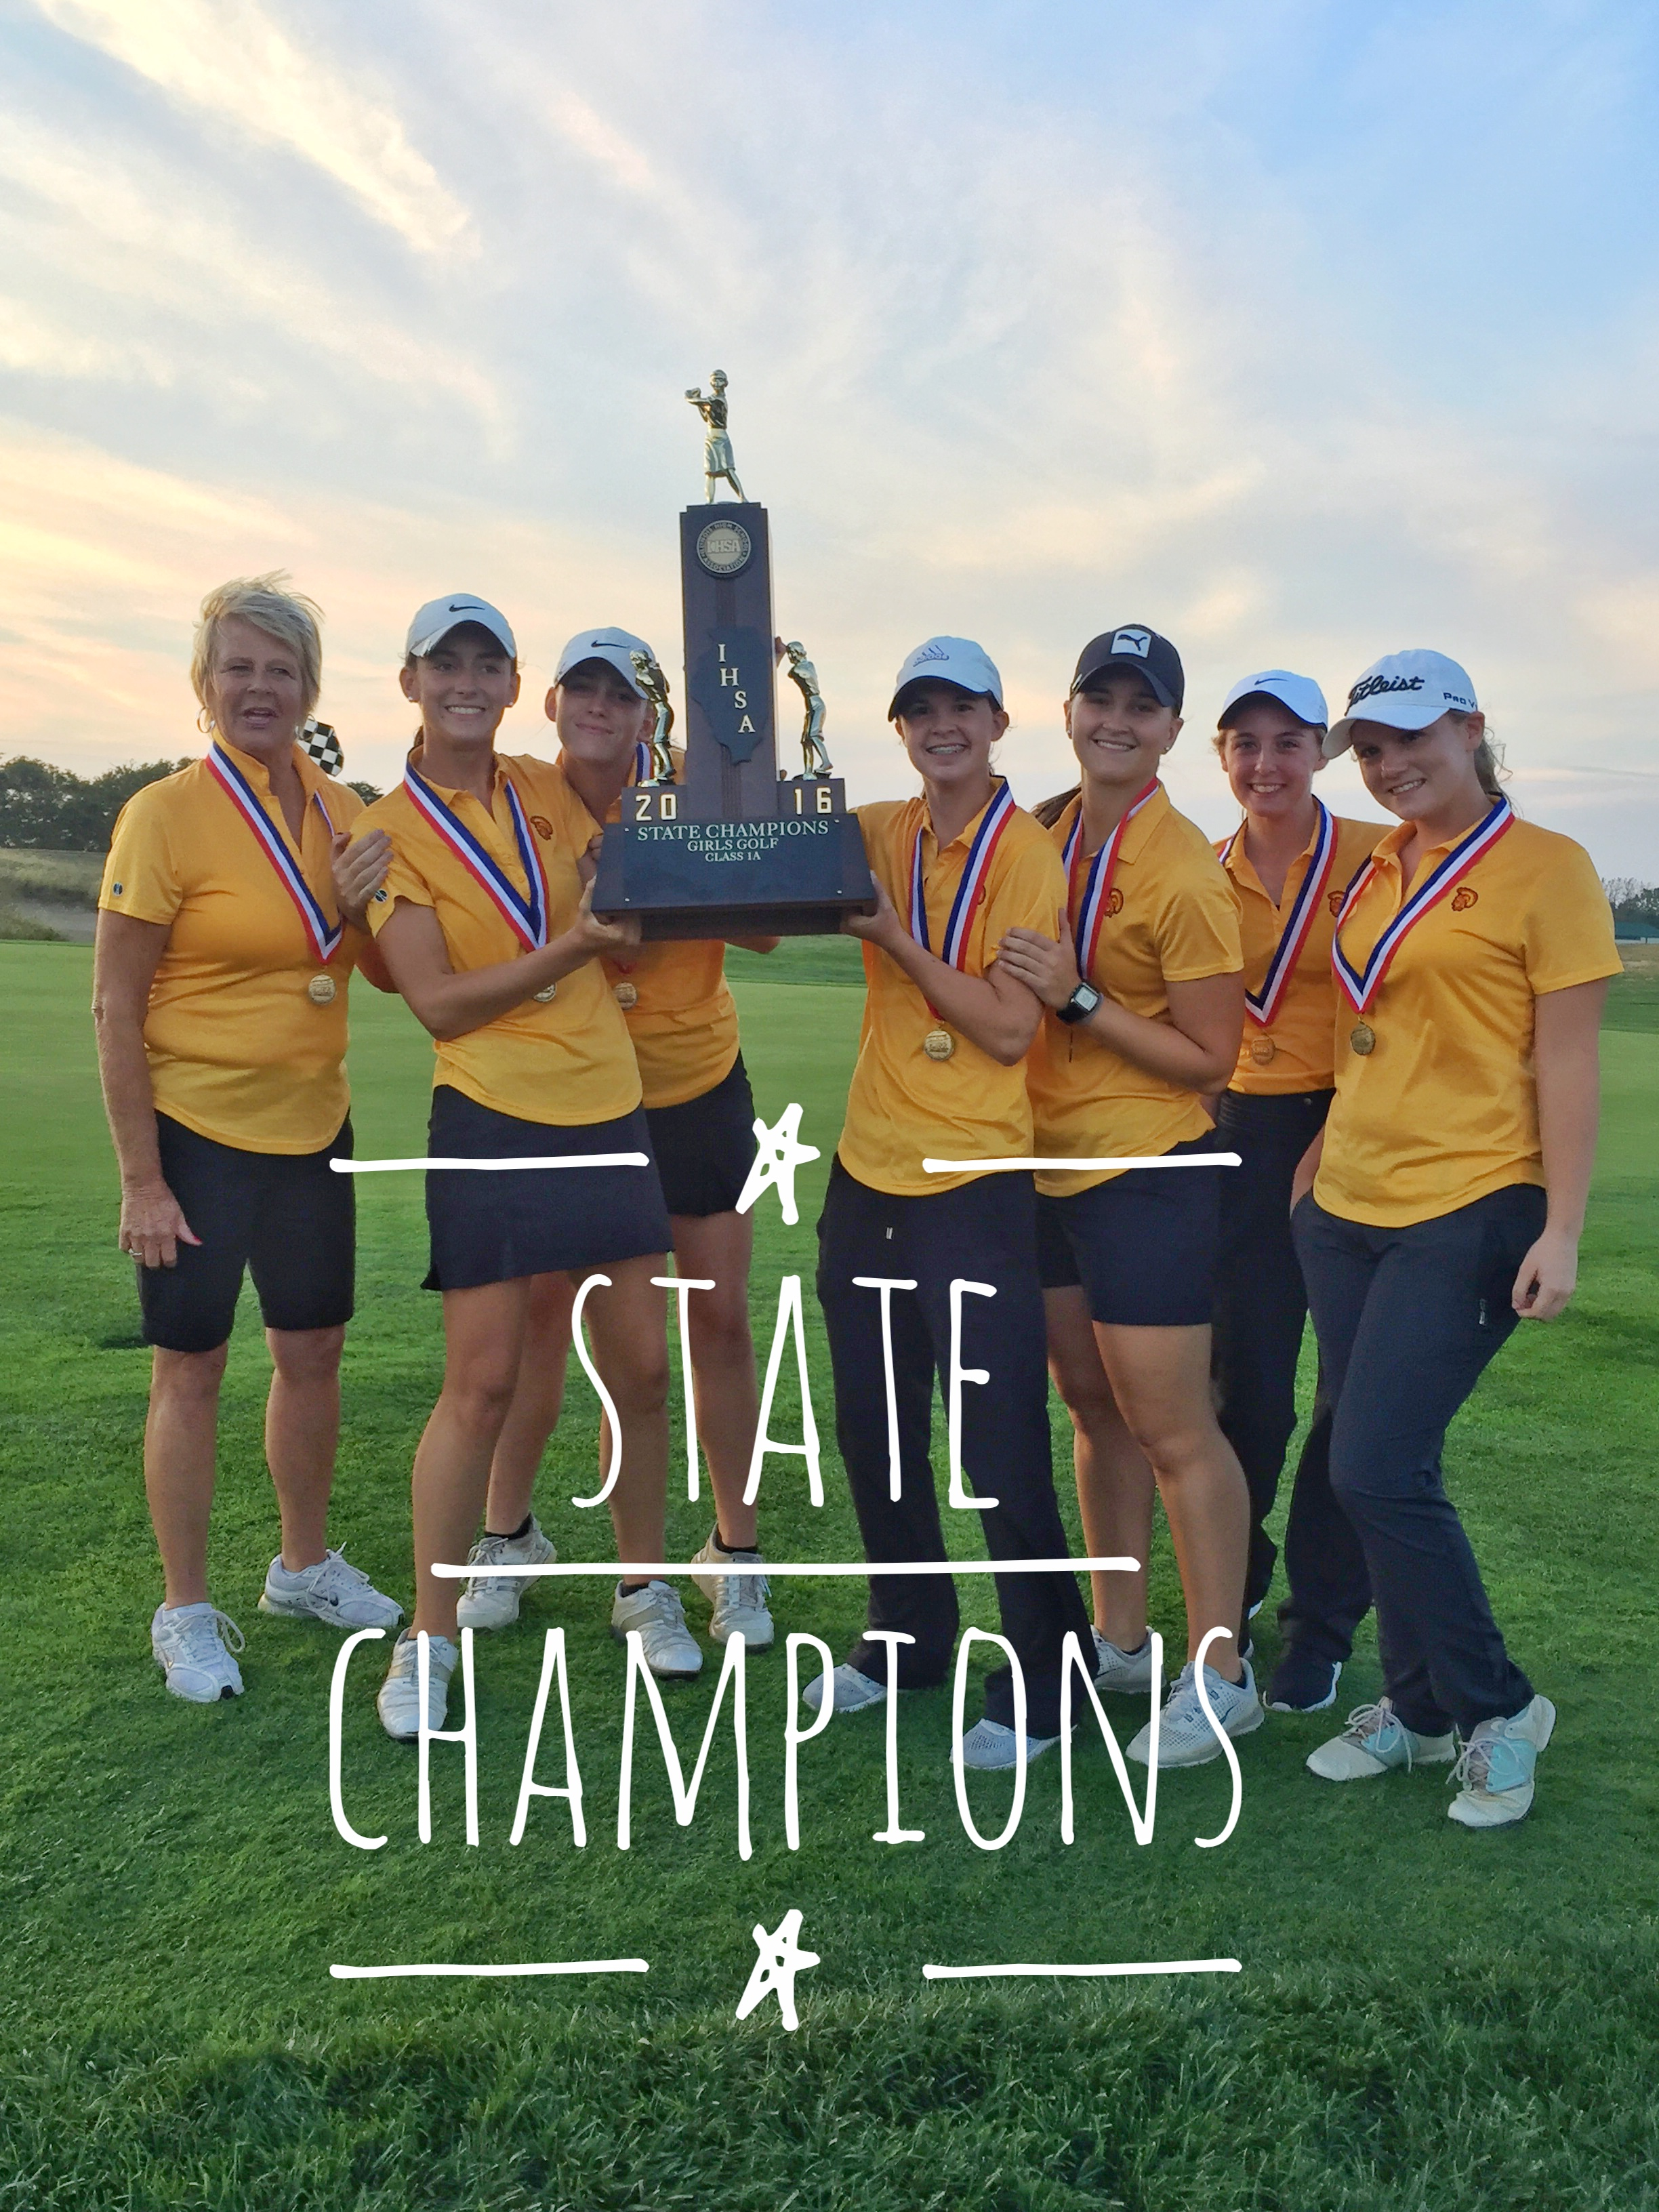 2016 IHSA Girls State Team Champions